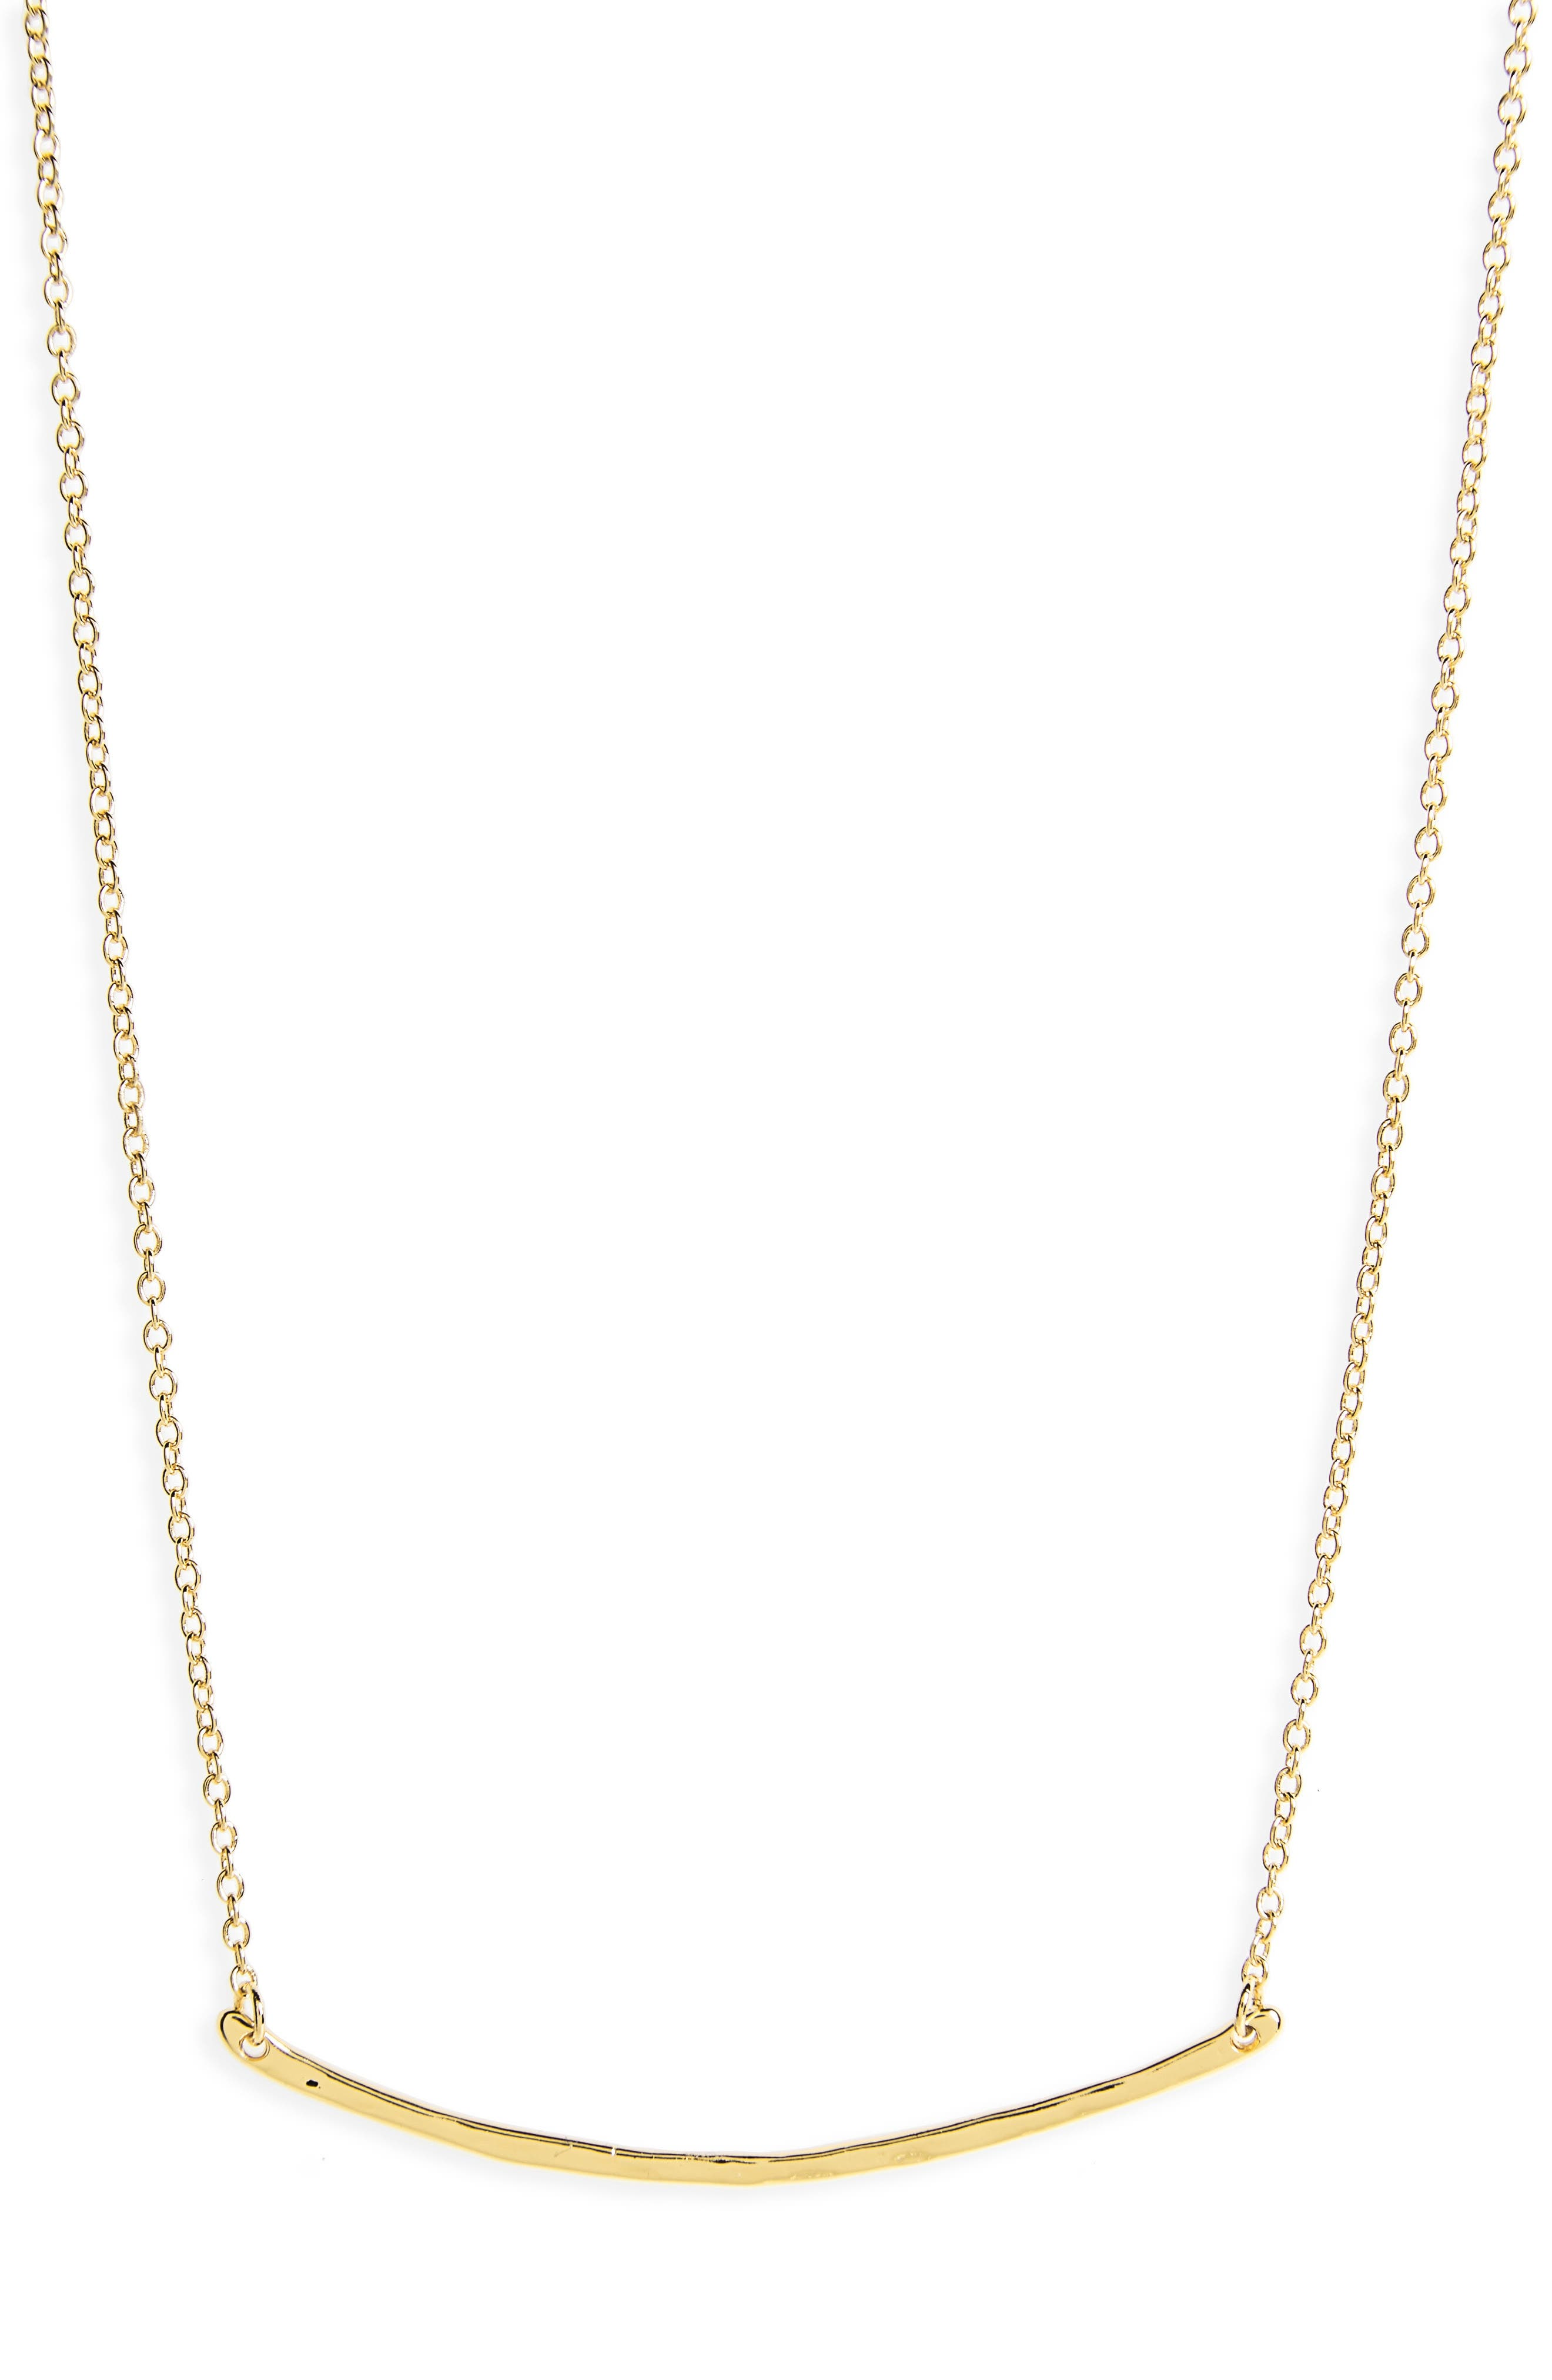 Main Image - gorjana Taner Bar Small Necklace